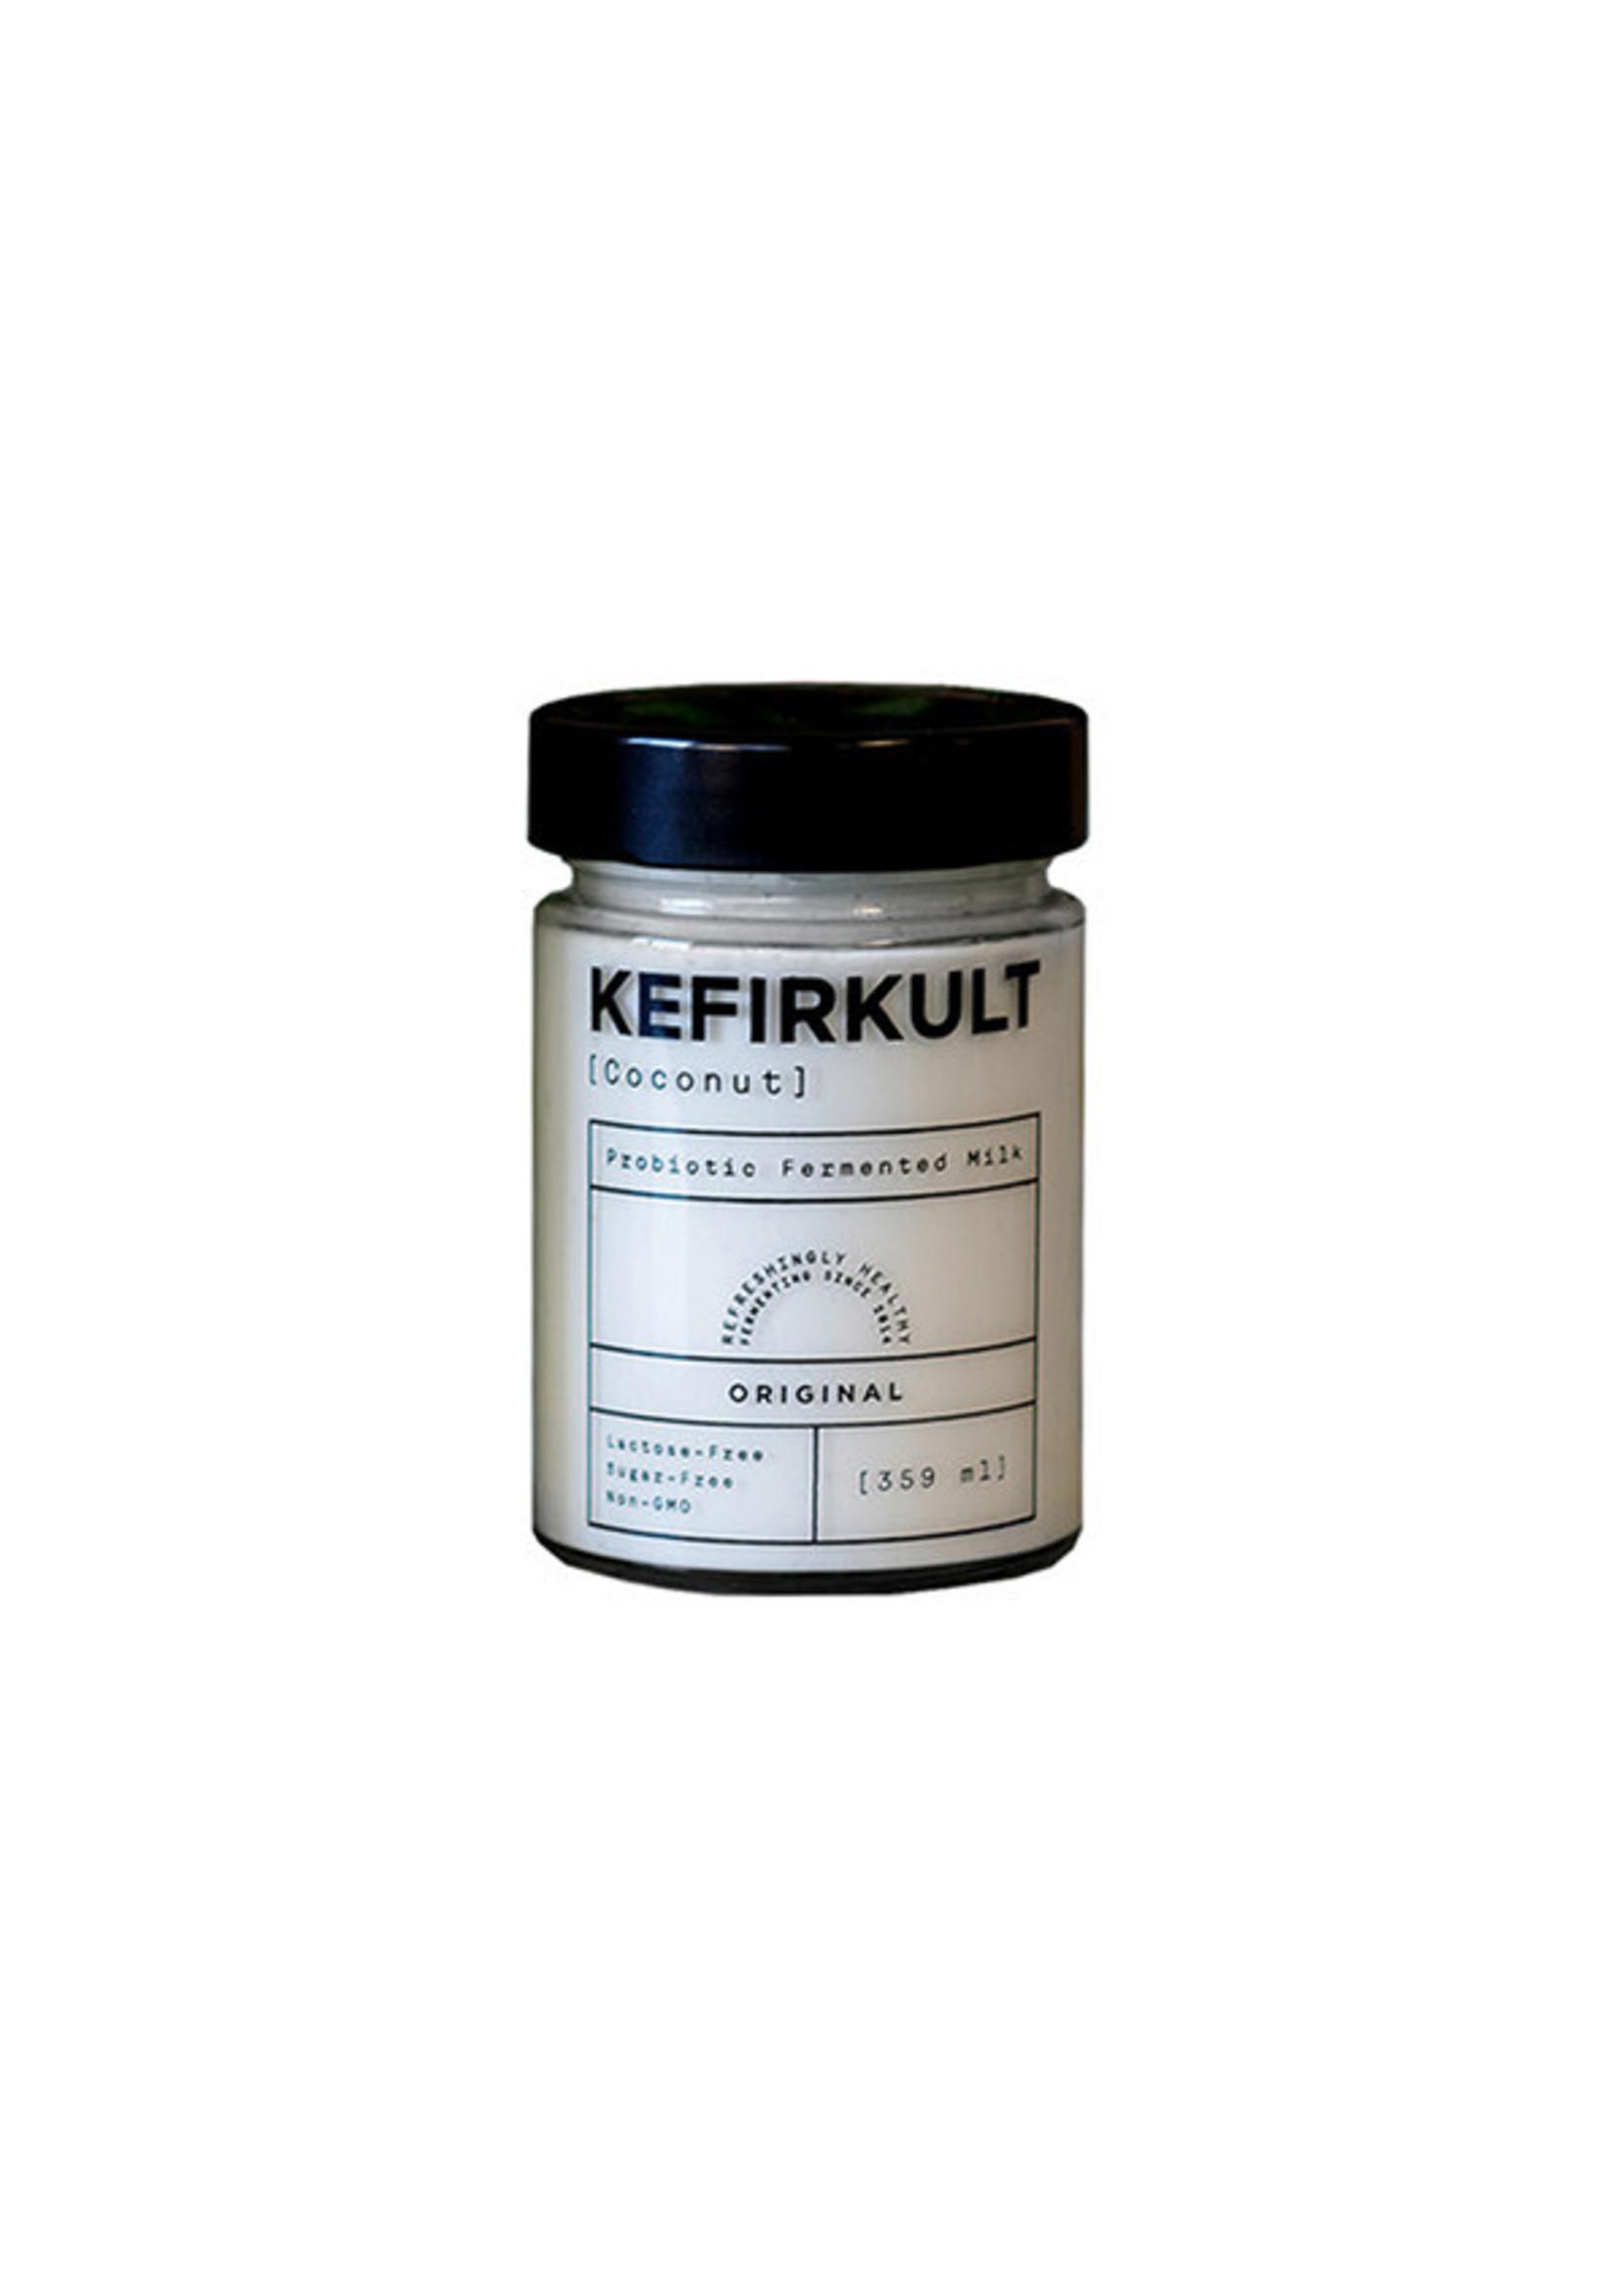 KefirKult KEFIRKULT Coconut YOGURT KEFIR 359ml